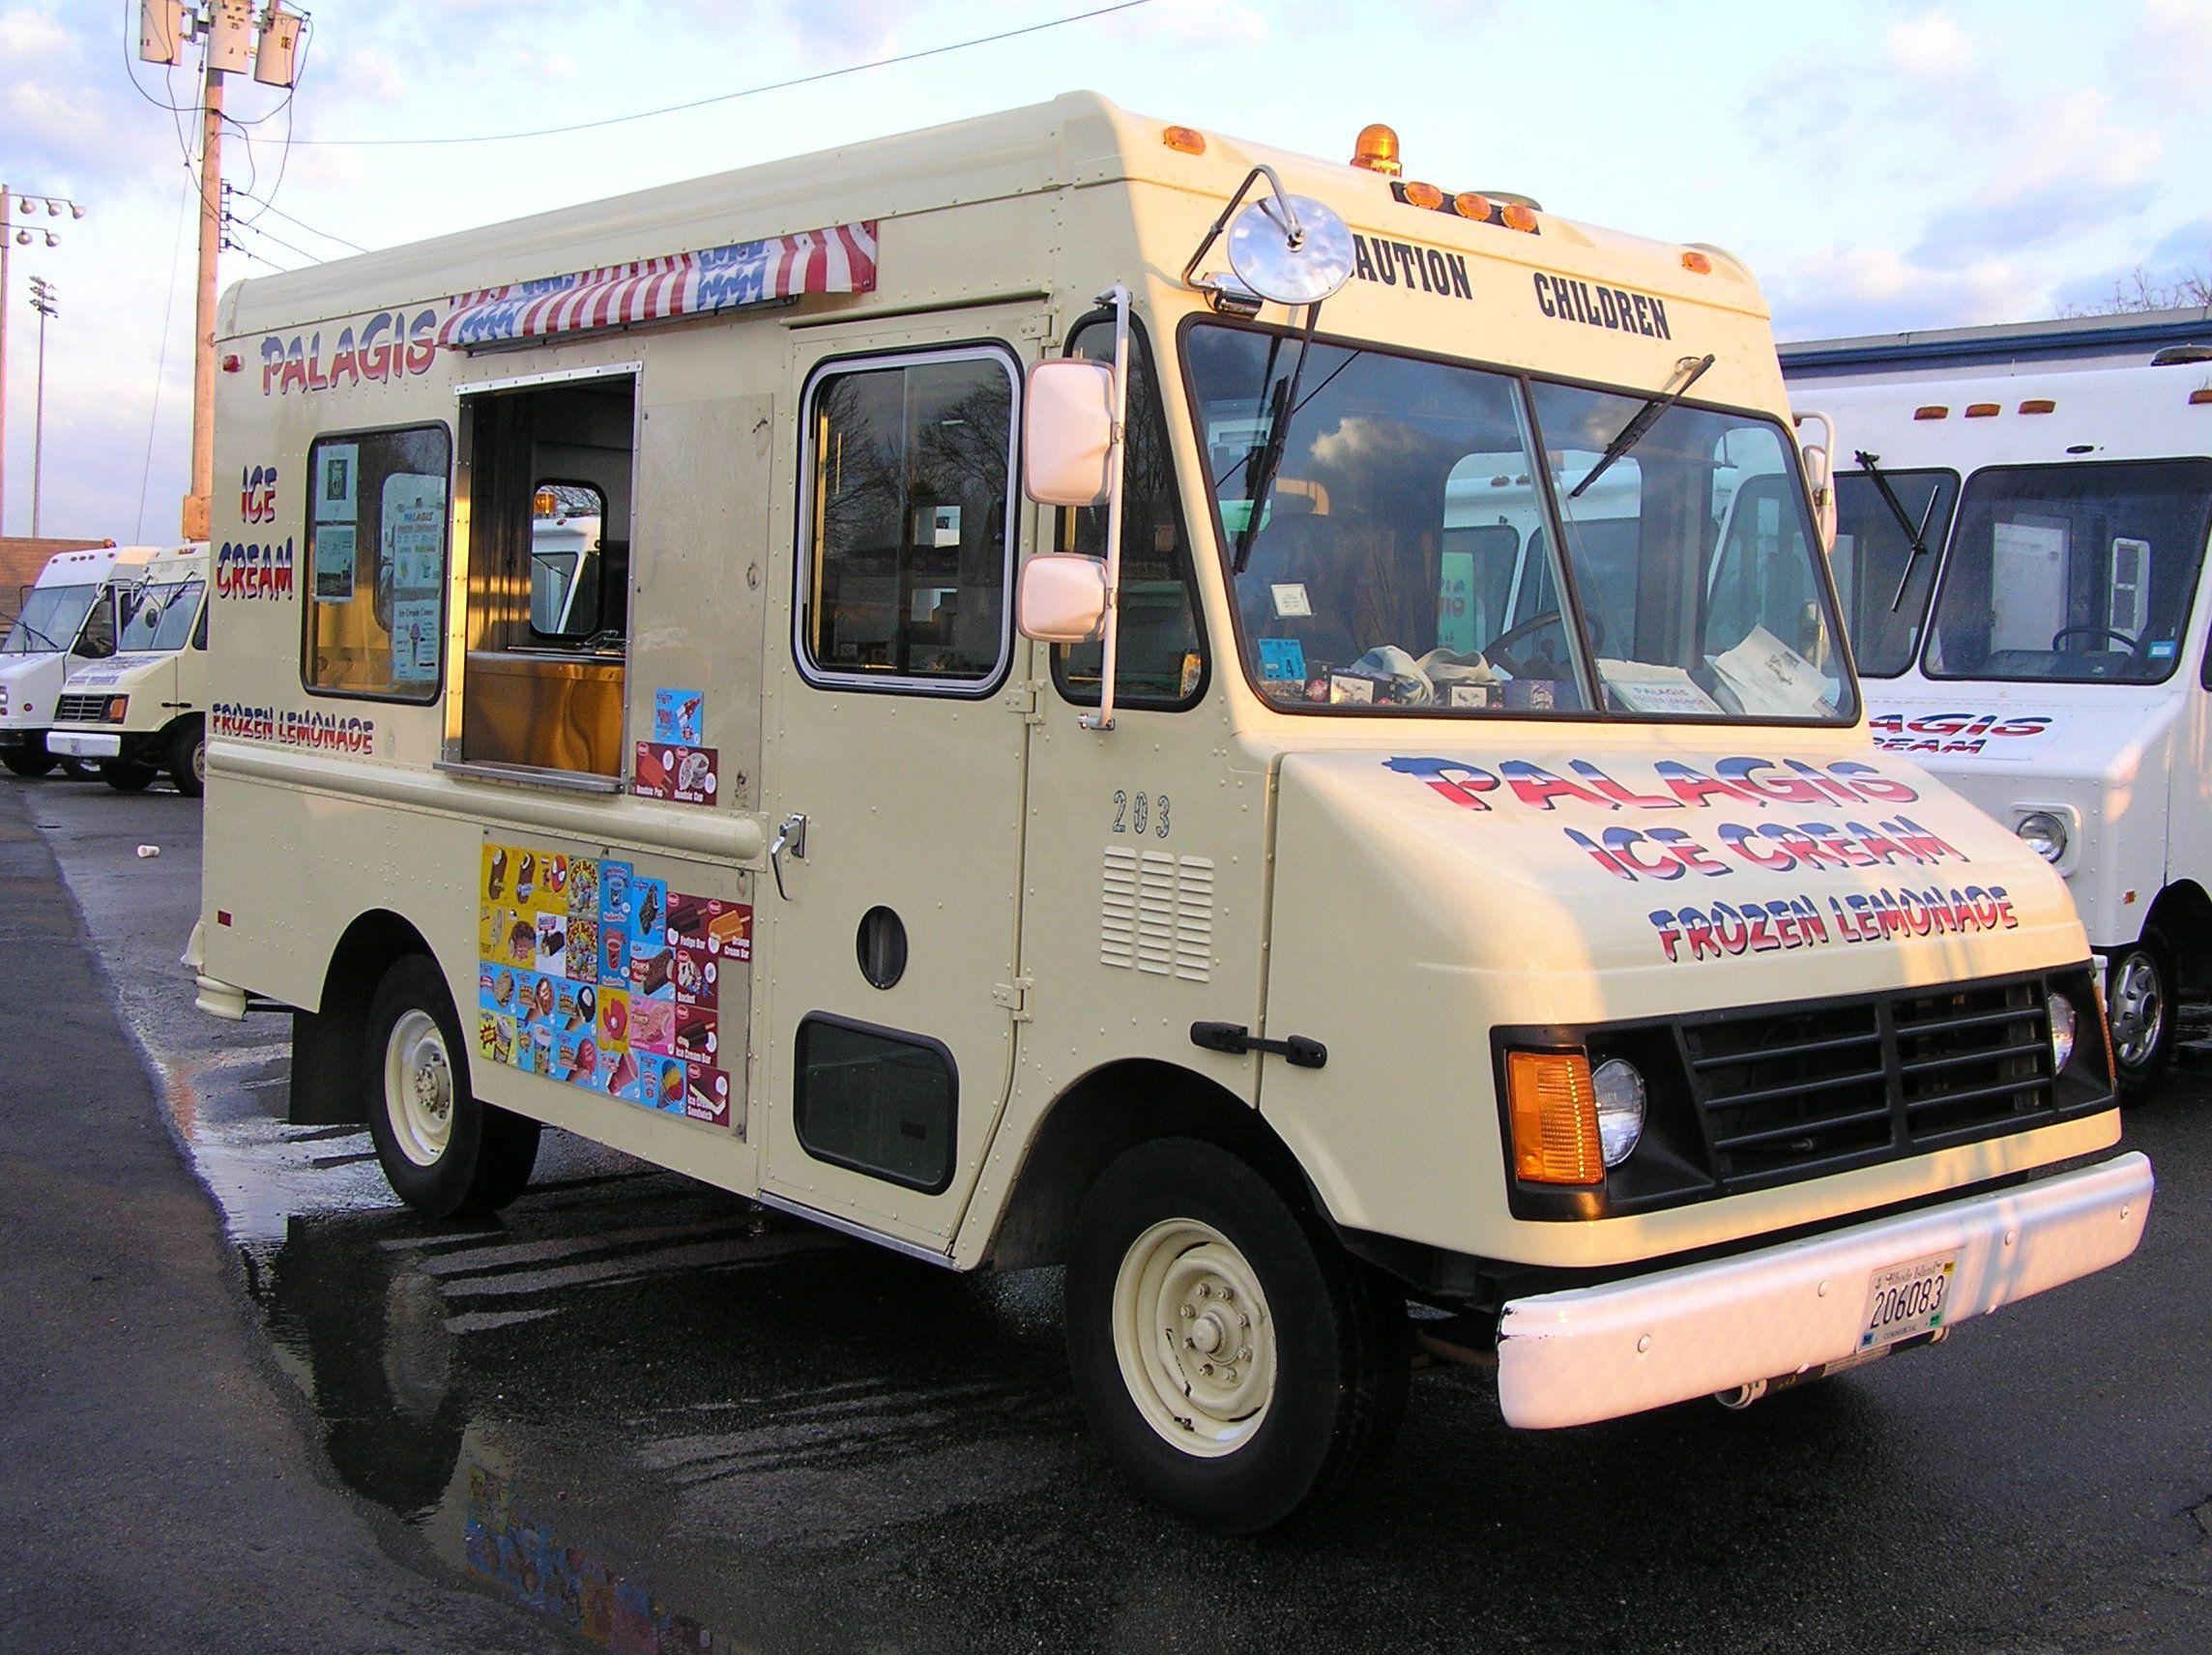 Ice cream truck ice cream truck ice cream van trucks